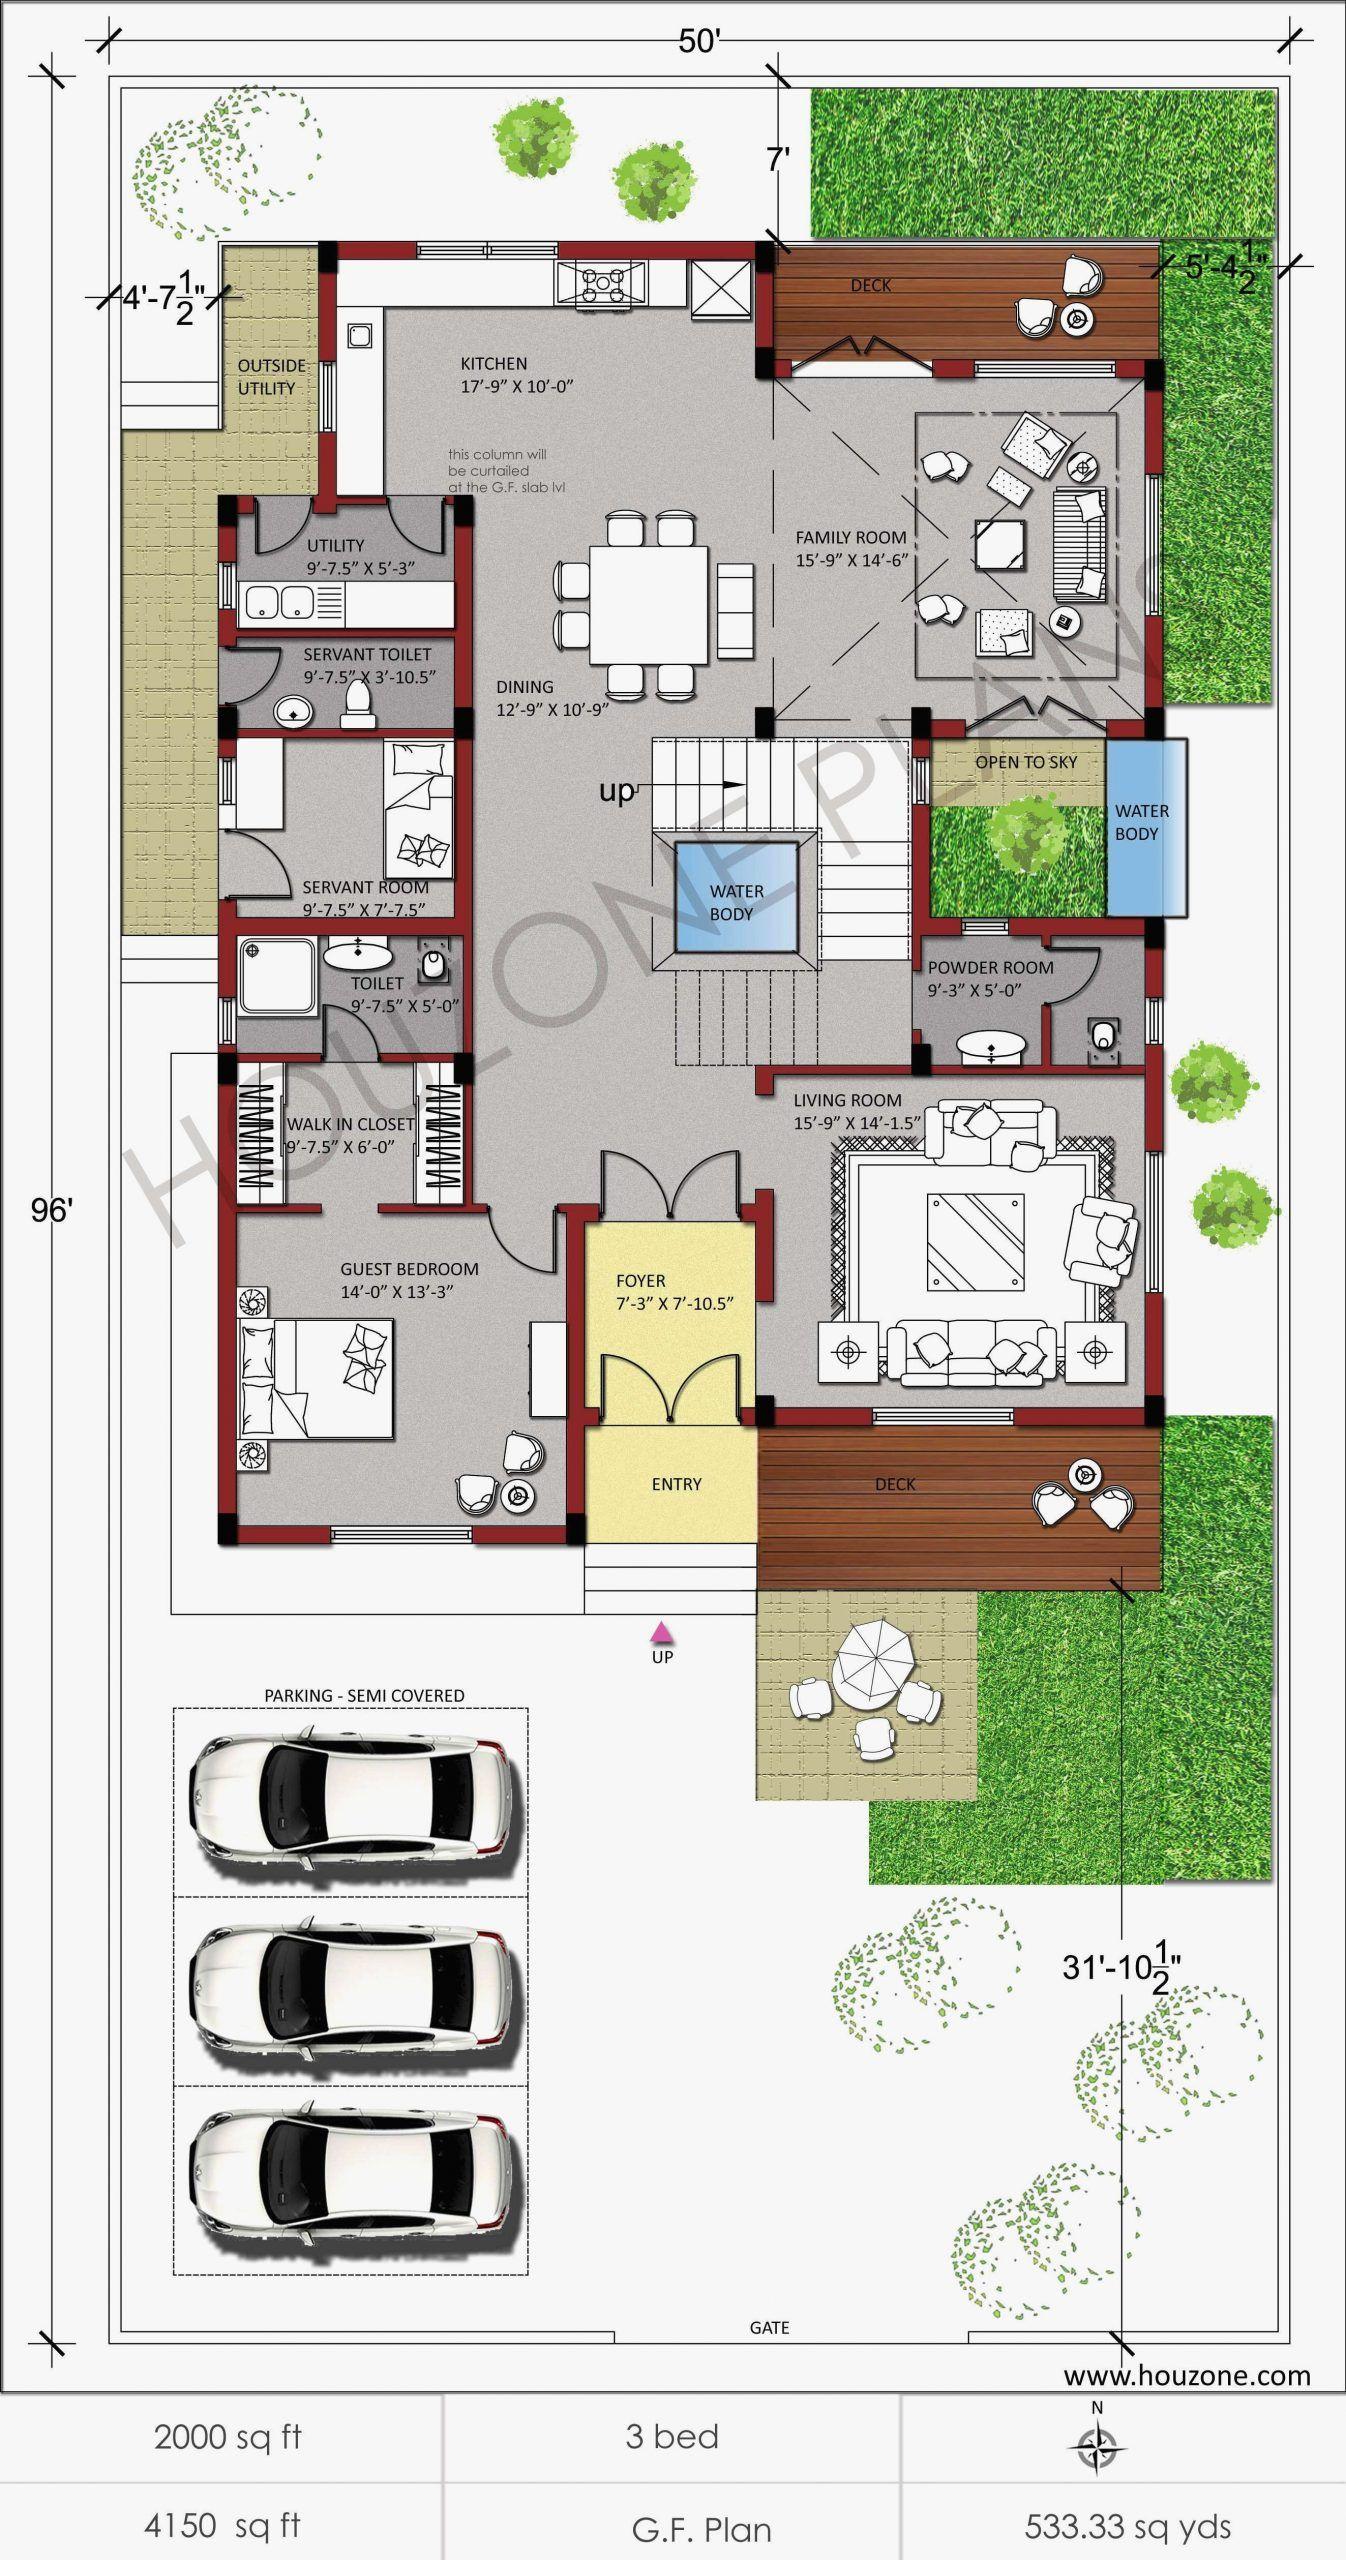 3 Bedroom Duplex House Plans 2021 Denah Lantai Denah Rumah Arsitektur